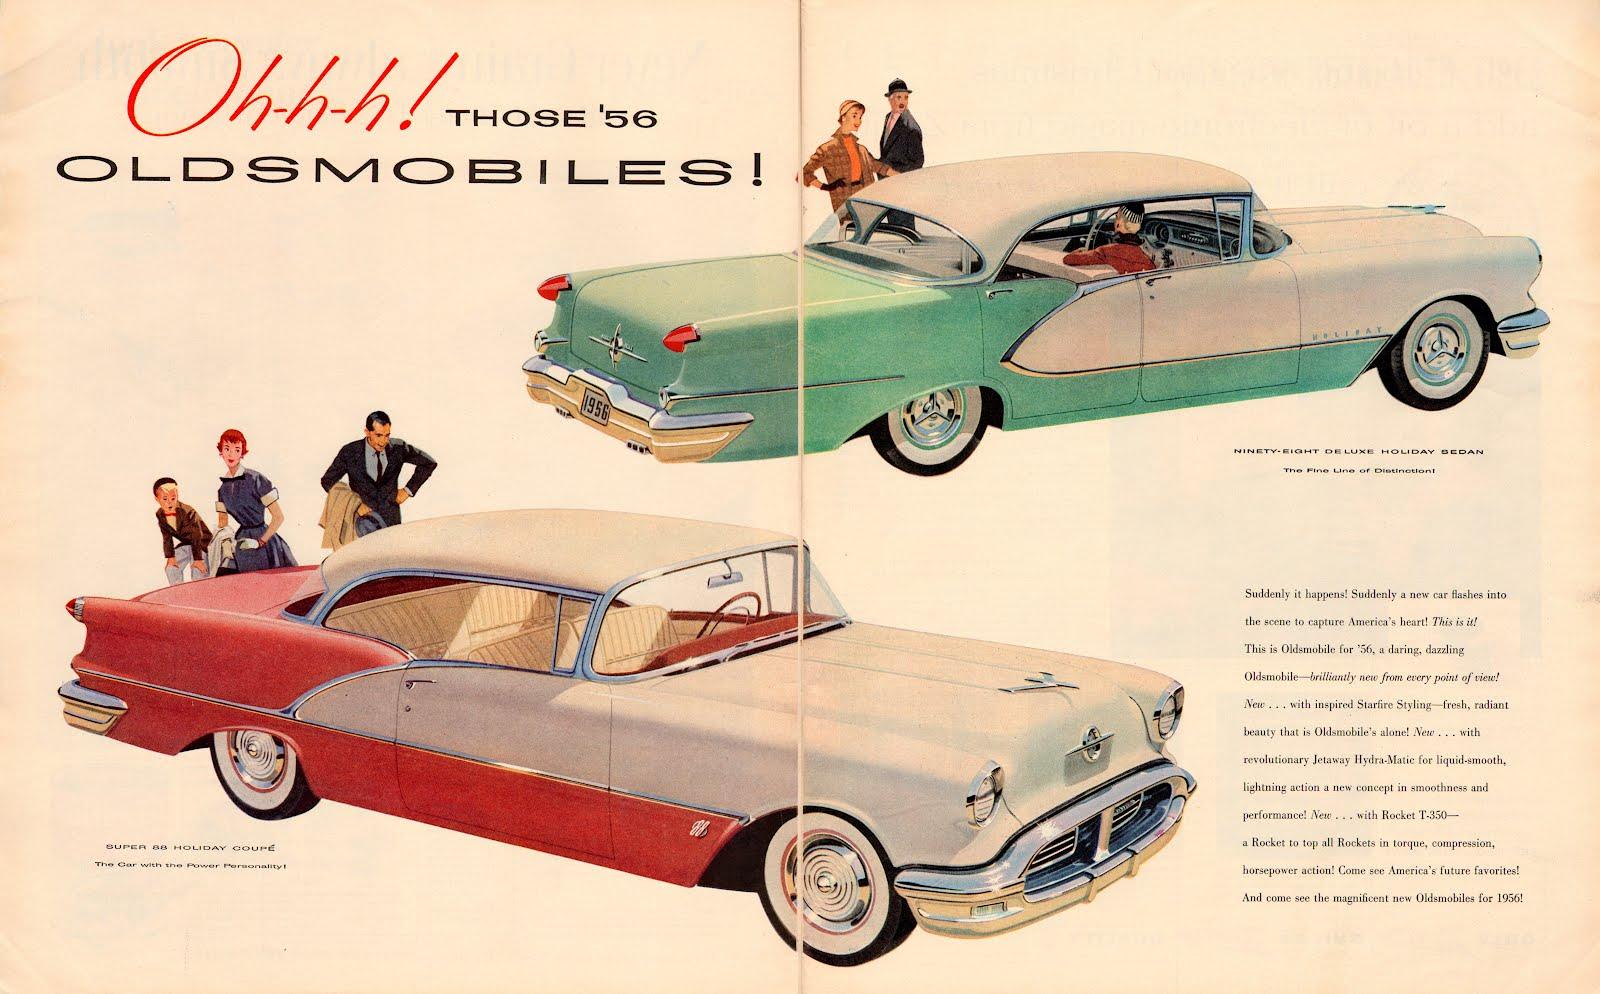 Ohhh! Those '56Oldsmobiles!